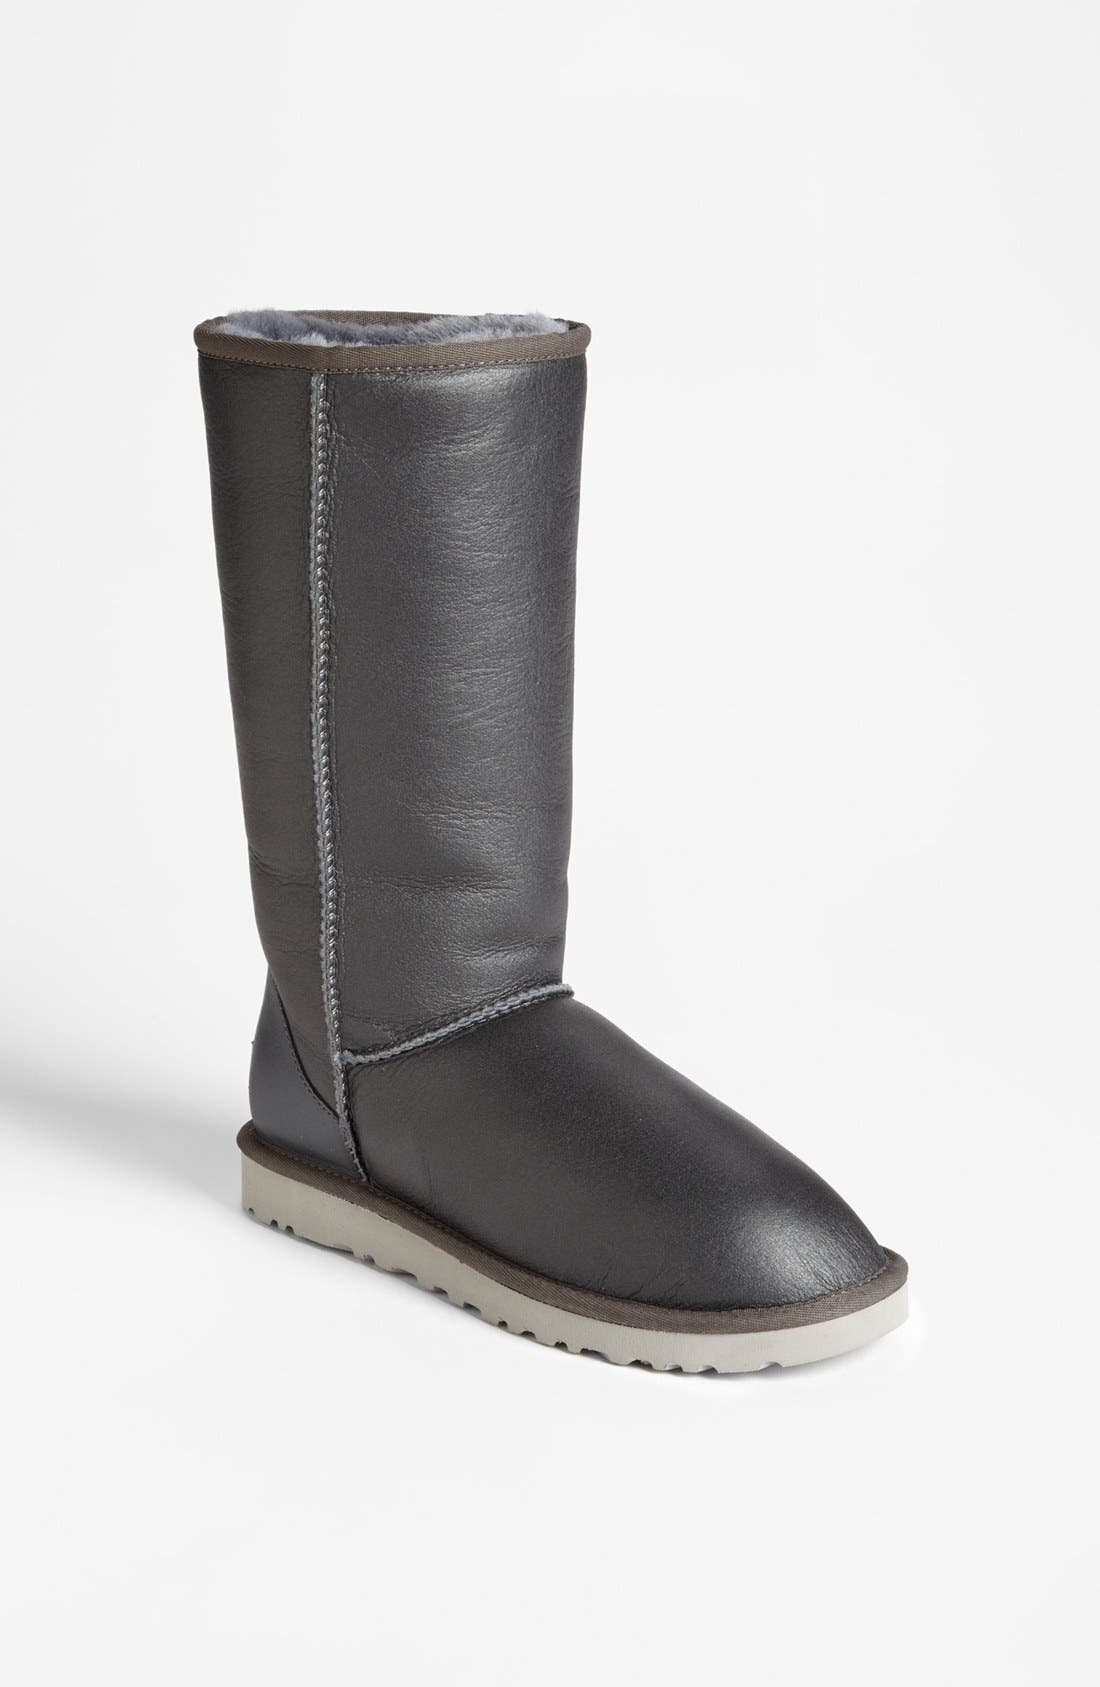 Alternate Image 1 Selected - UGG® Australia 'Classic Tall Metallic' Boot (Women)